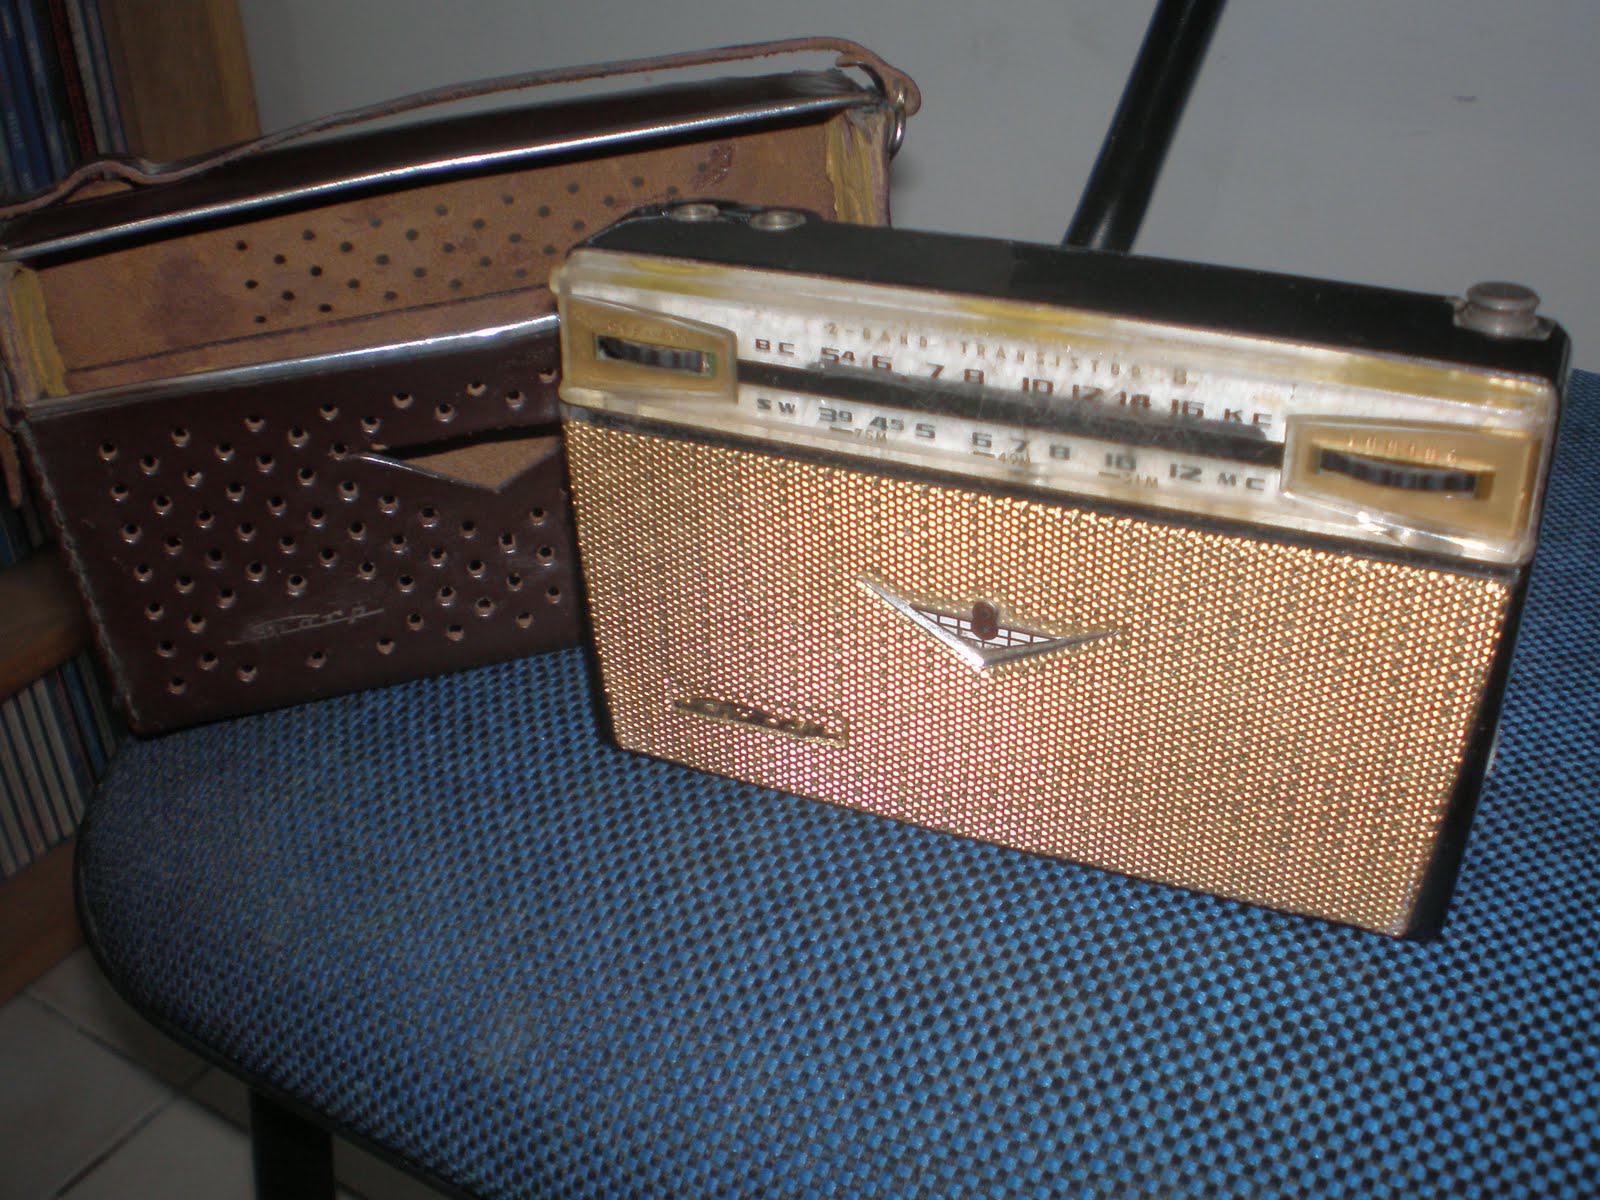 9c365ddd88d RADIO 2 FAIXAS SHARP TRANSISTOR EIGHT MODEL BX-327 ANO 1961 MADE IN JAPAN